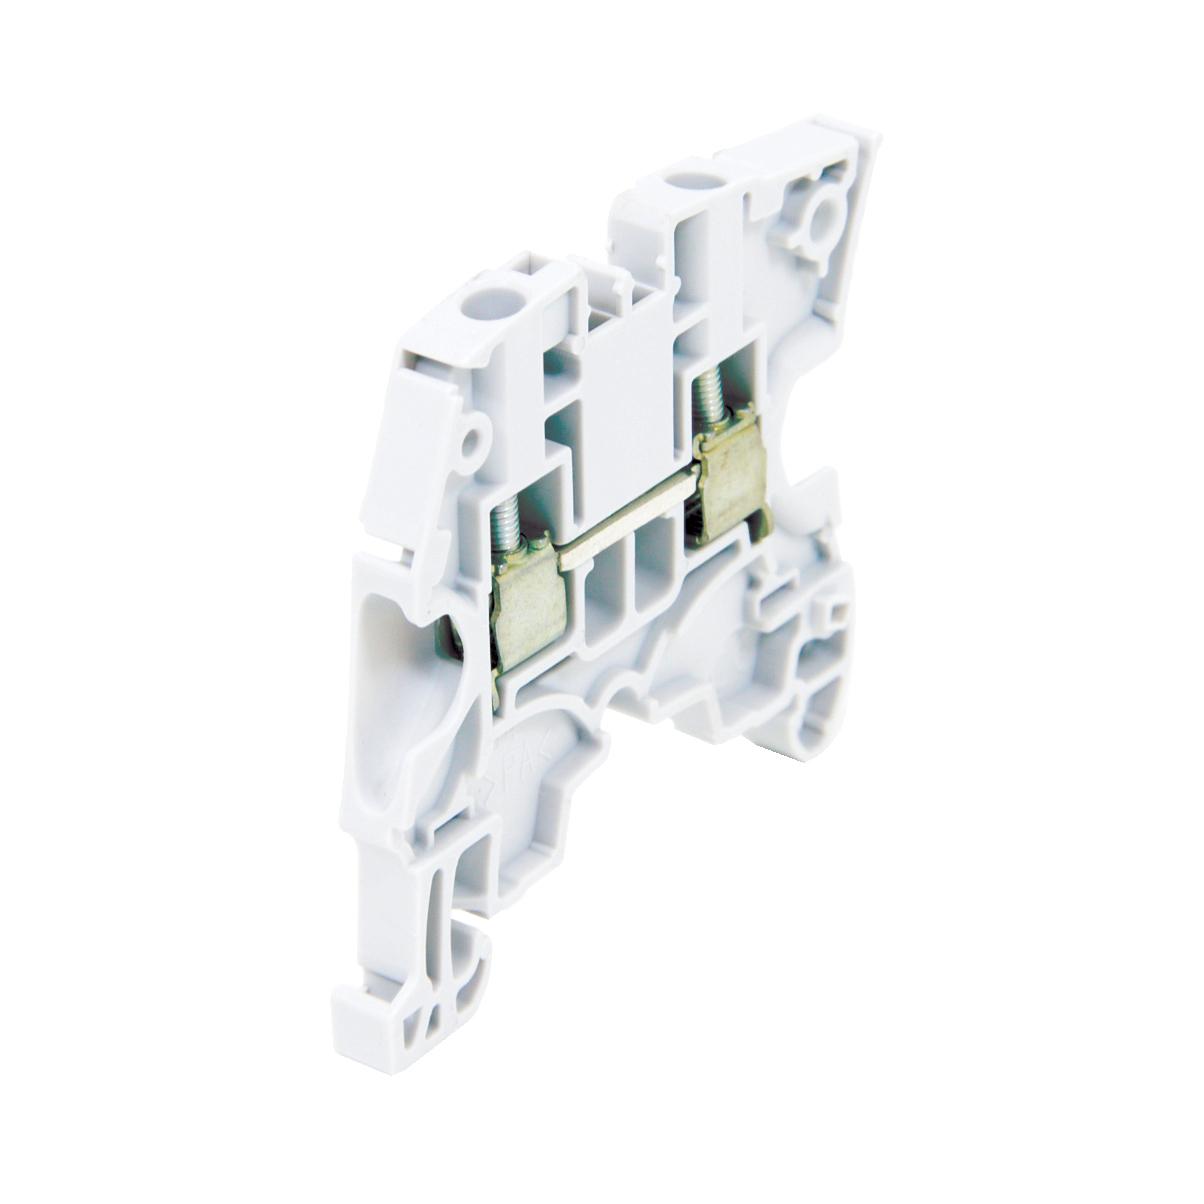 Power Distribution & Conditioning/Power Distribution Blocks